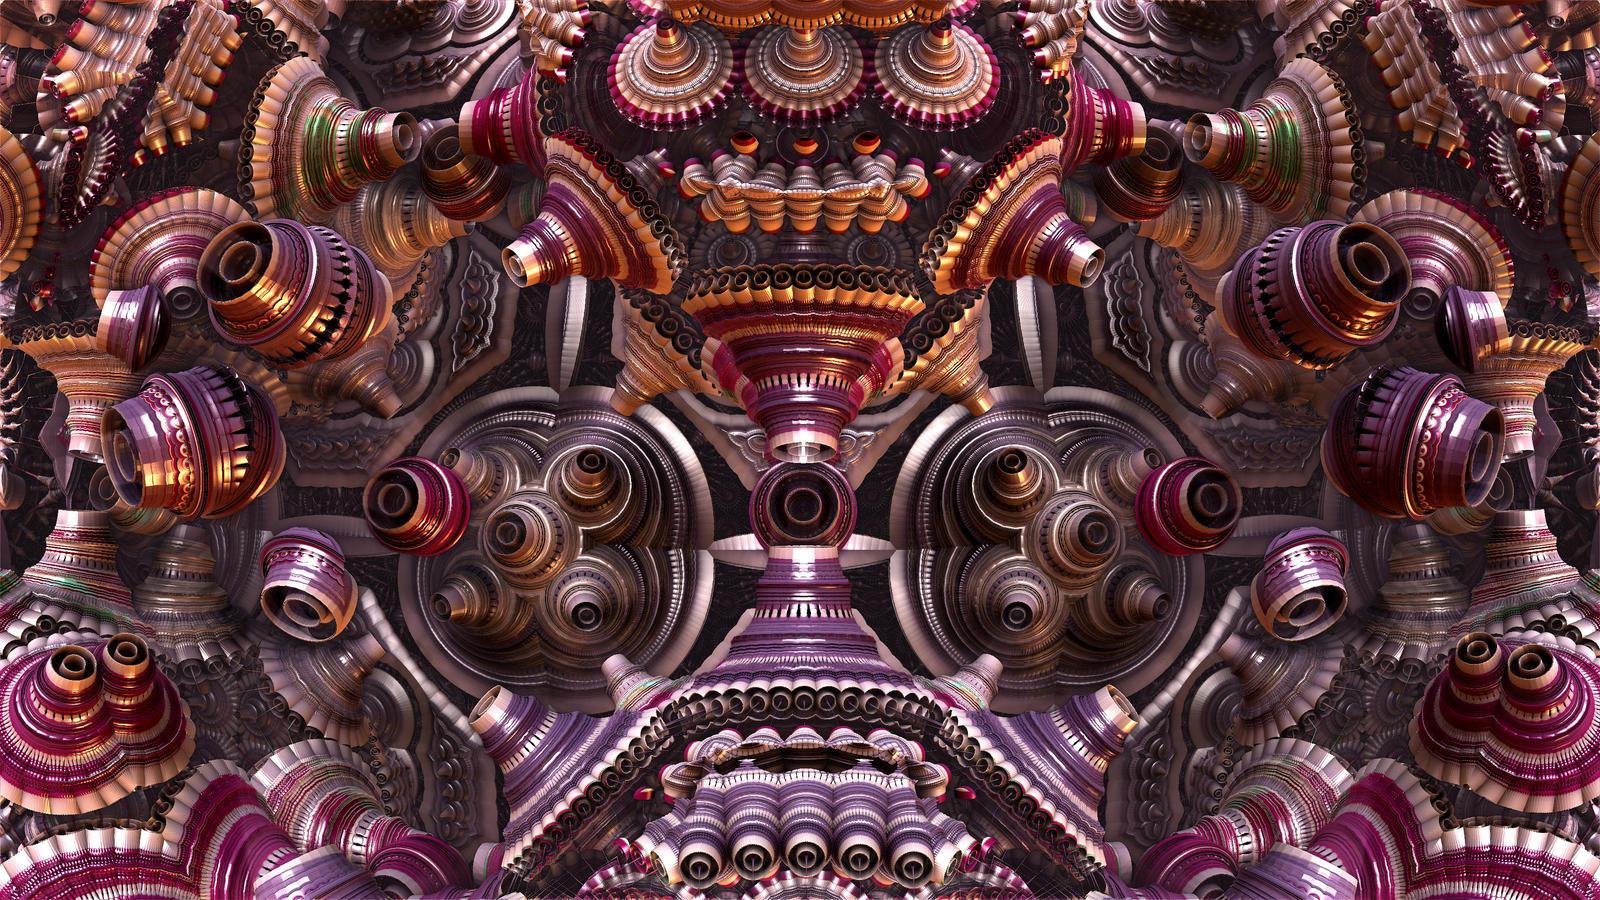 Purple Pypez by Baddad